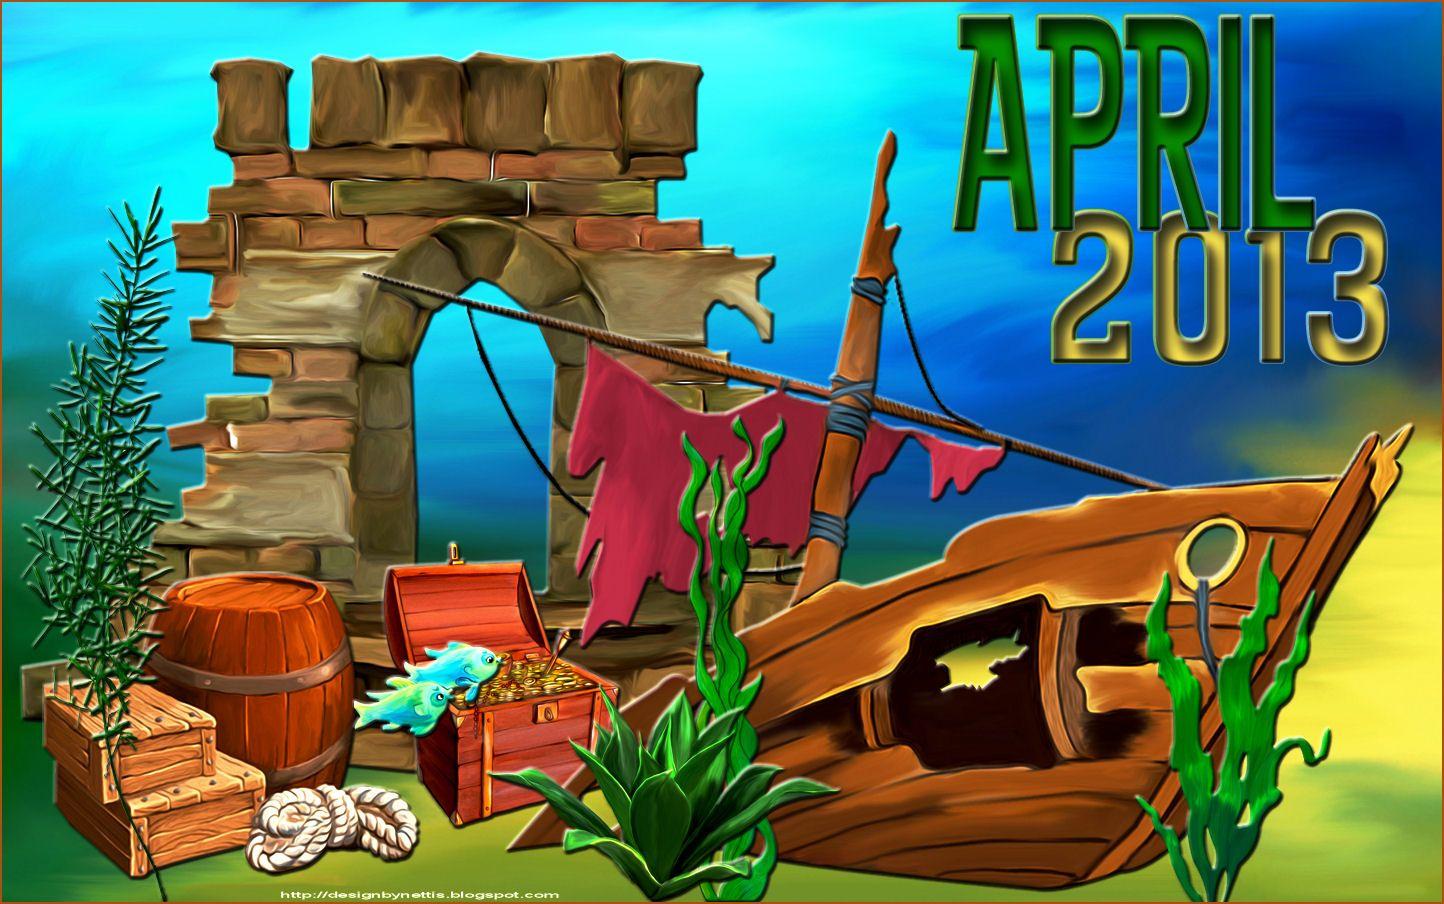 desktops wallpapers 4 april here are 4 desktops peek a boo